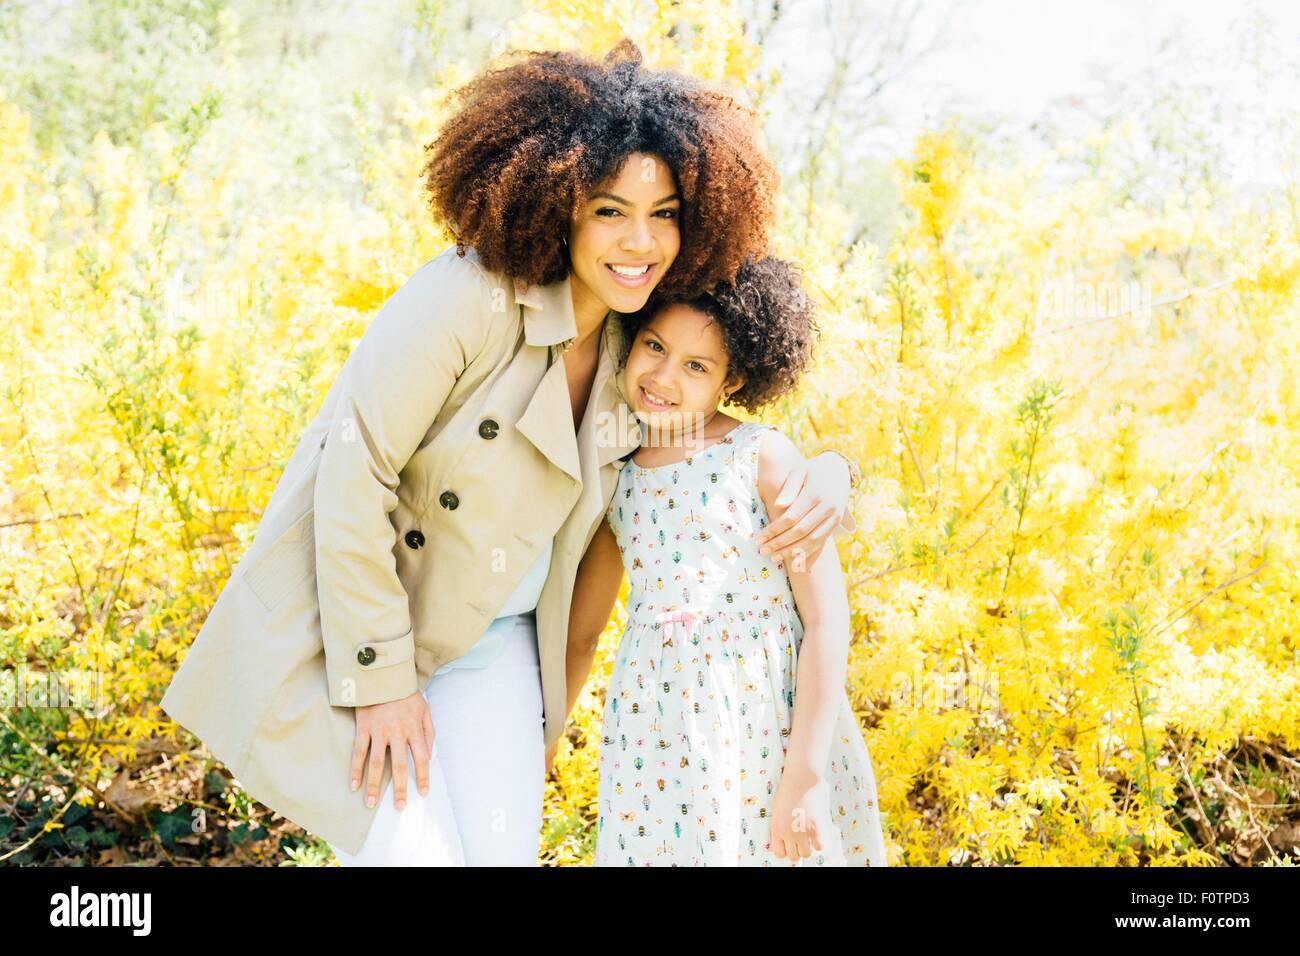 Porträt der Mutter Arm um Tochter, Blick in die Kamera, Lächeln Stockbild